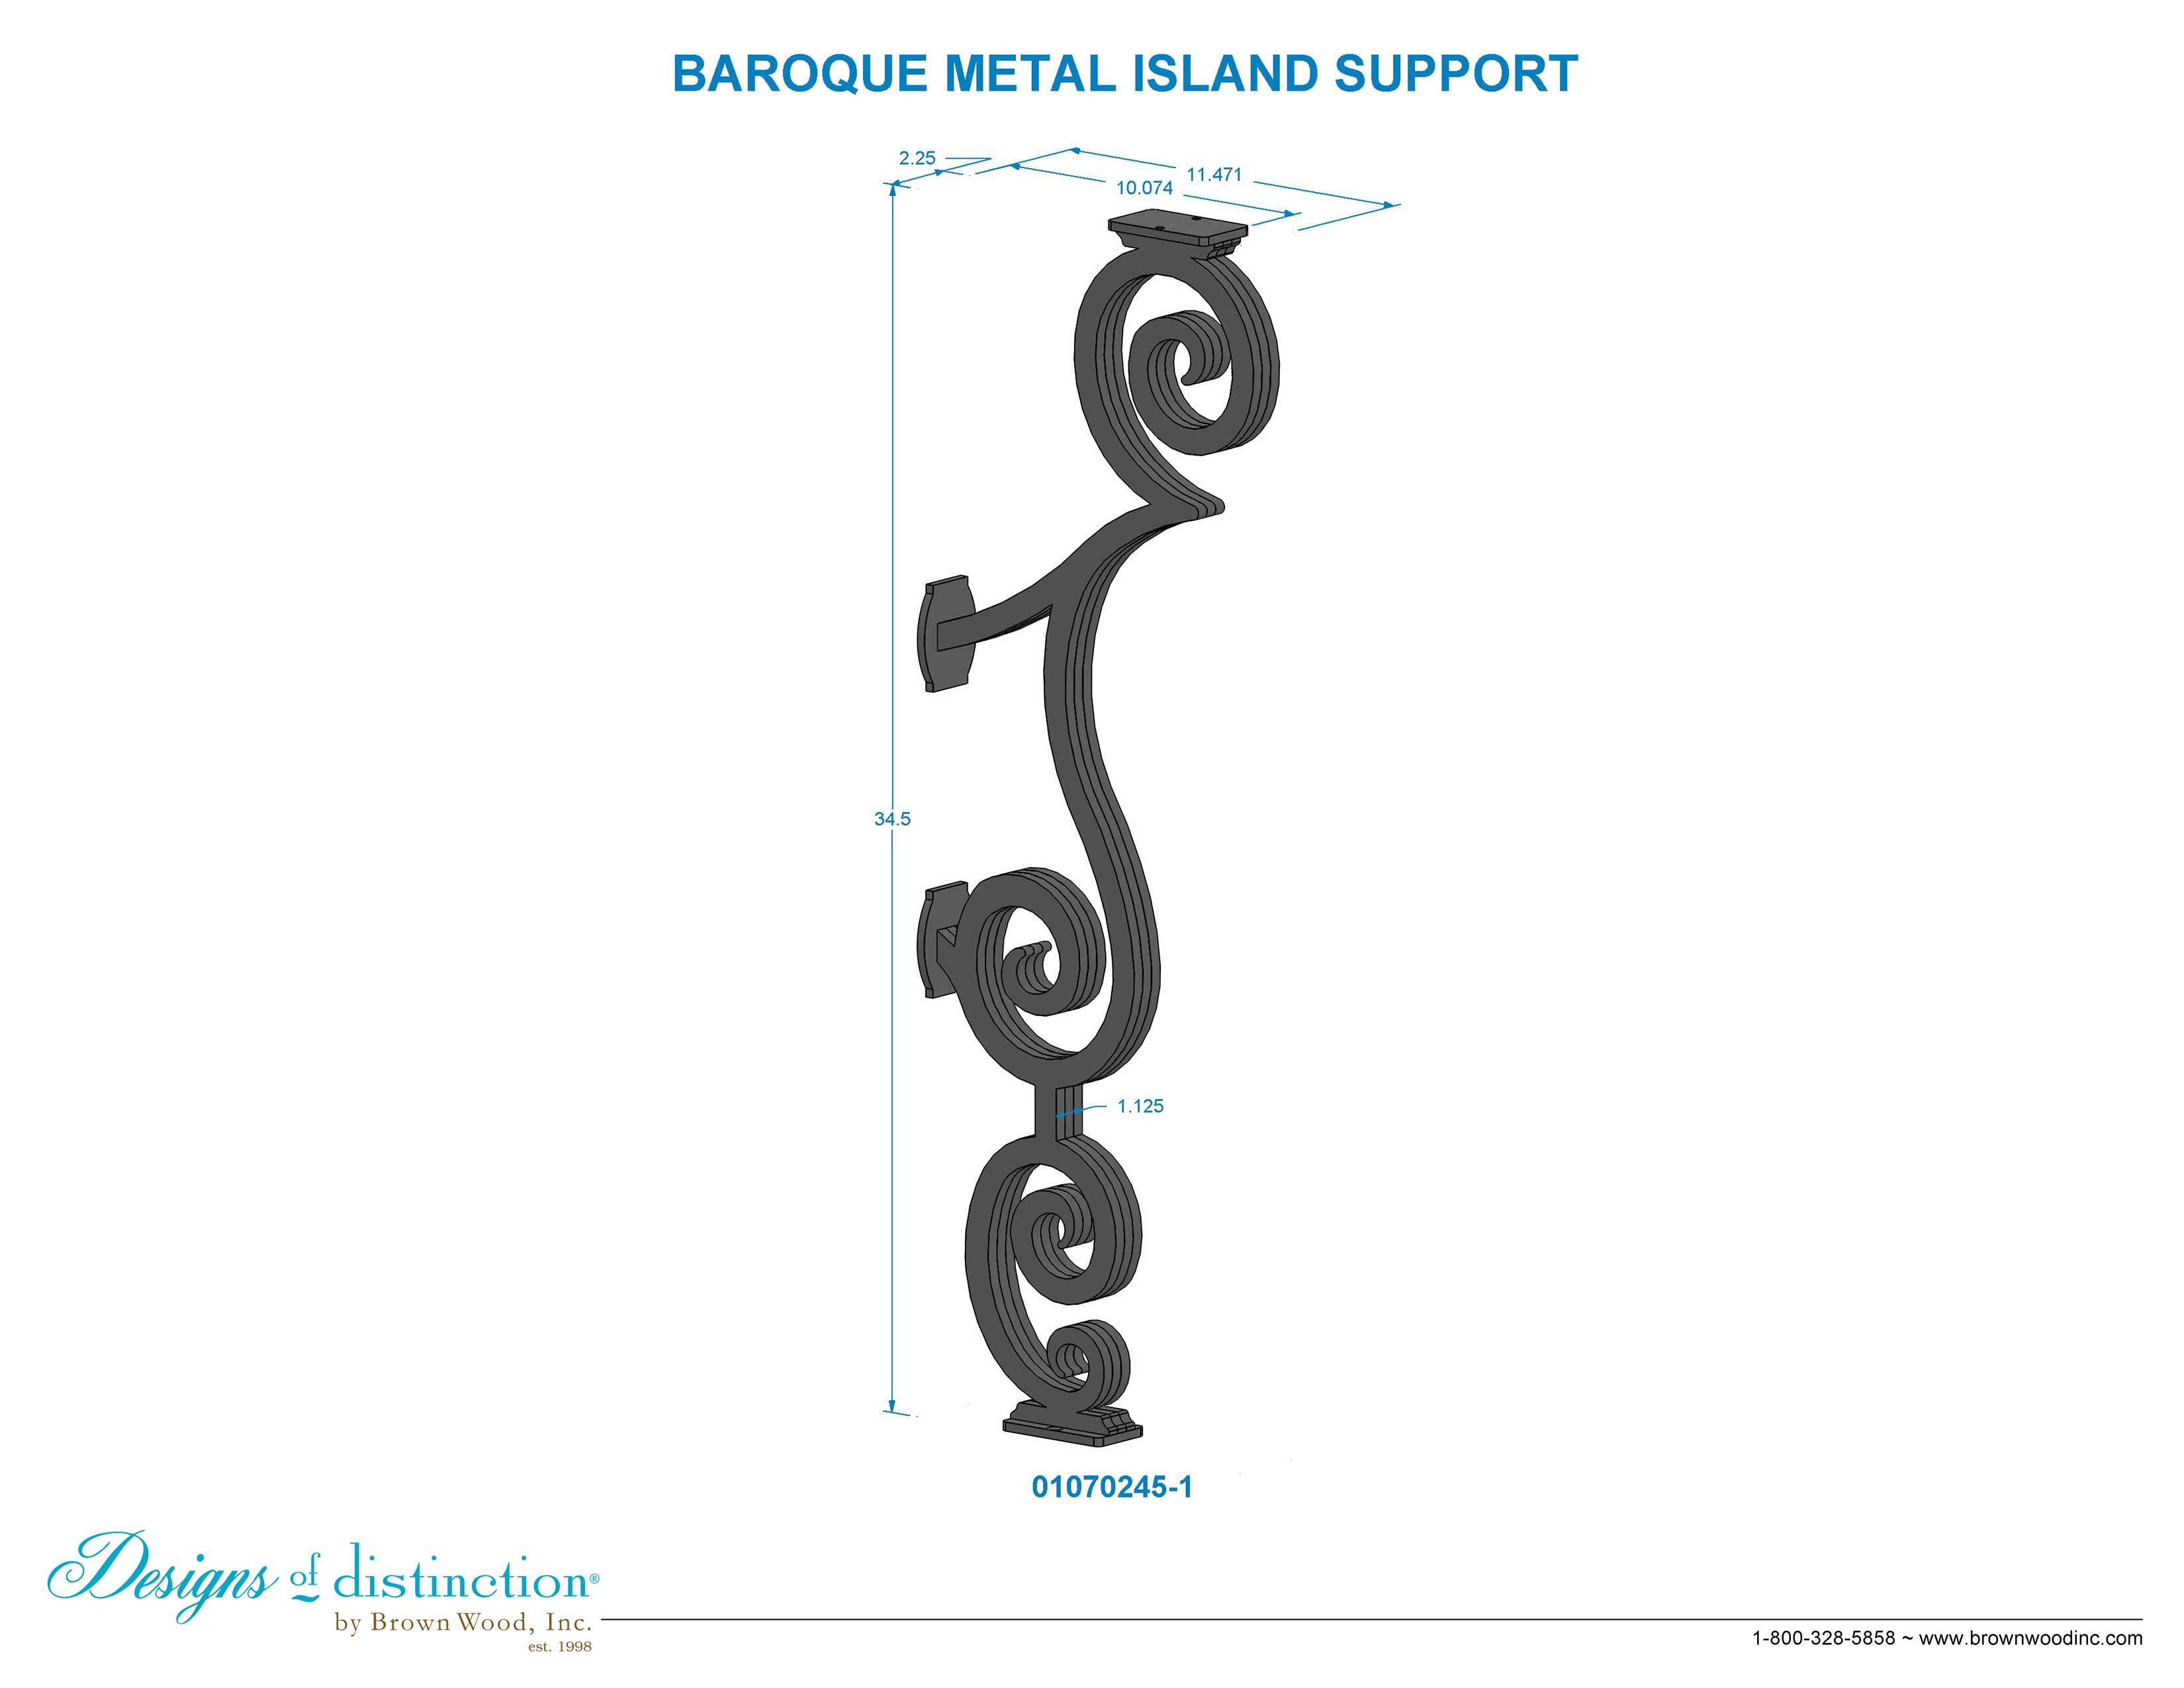 Baroque Iron Island Support